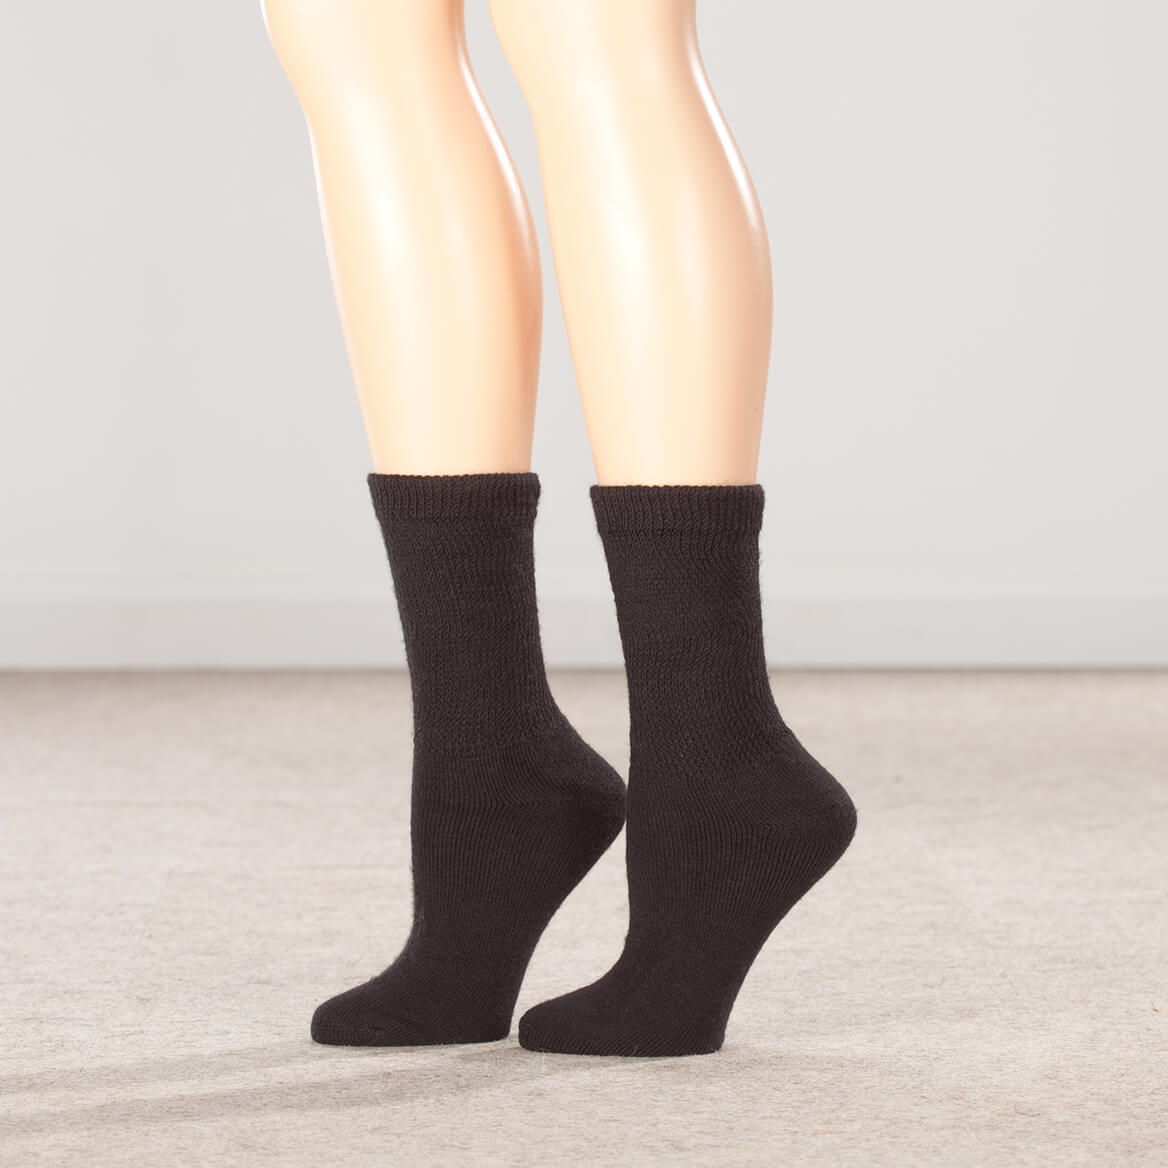 cec21e5306a Diabetic Nylon Ankle Hose - Ankle Compression Socks - Miles Kimball